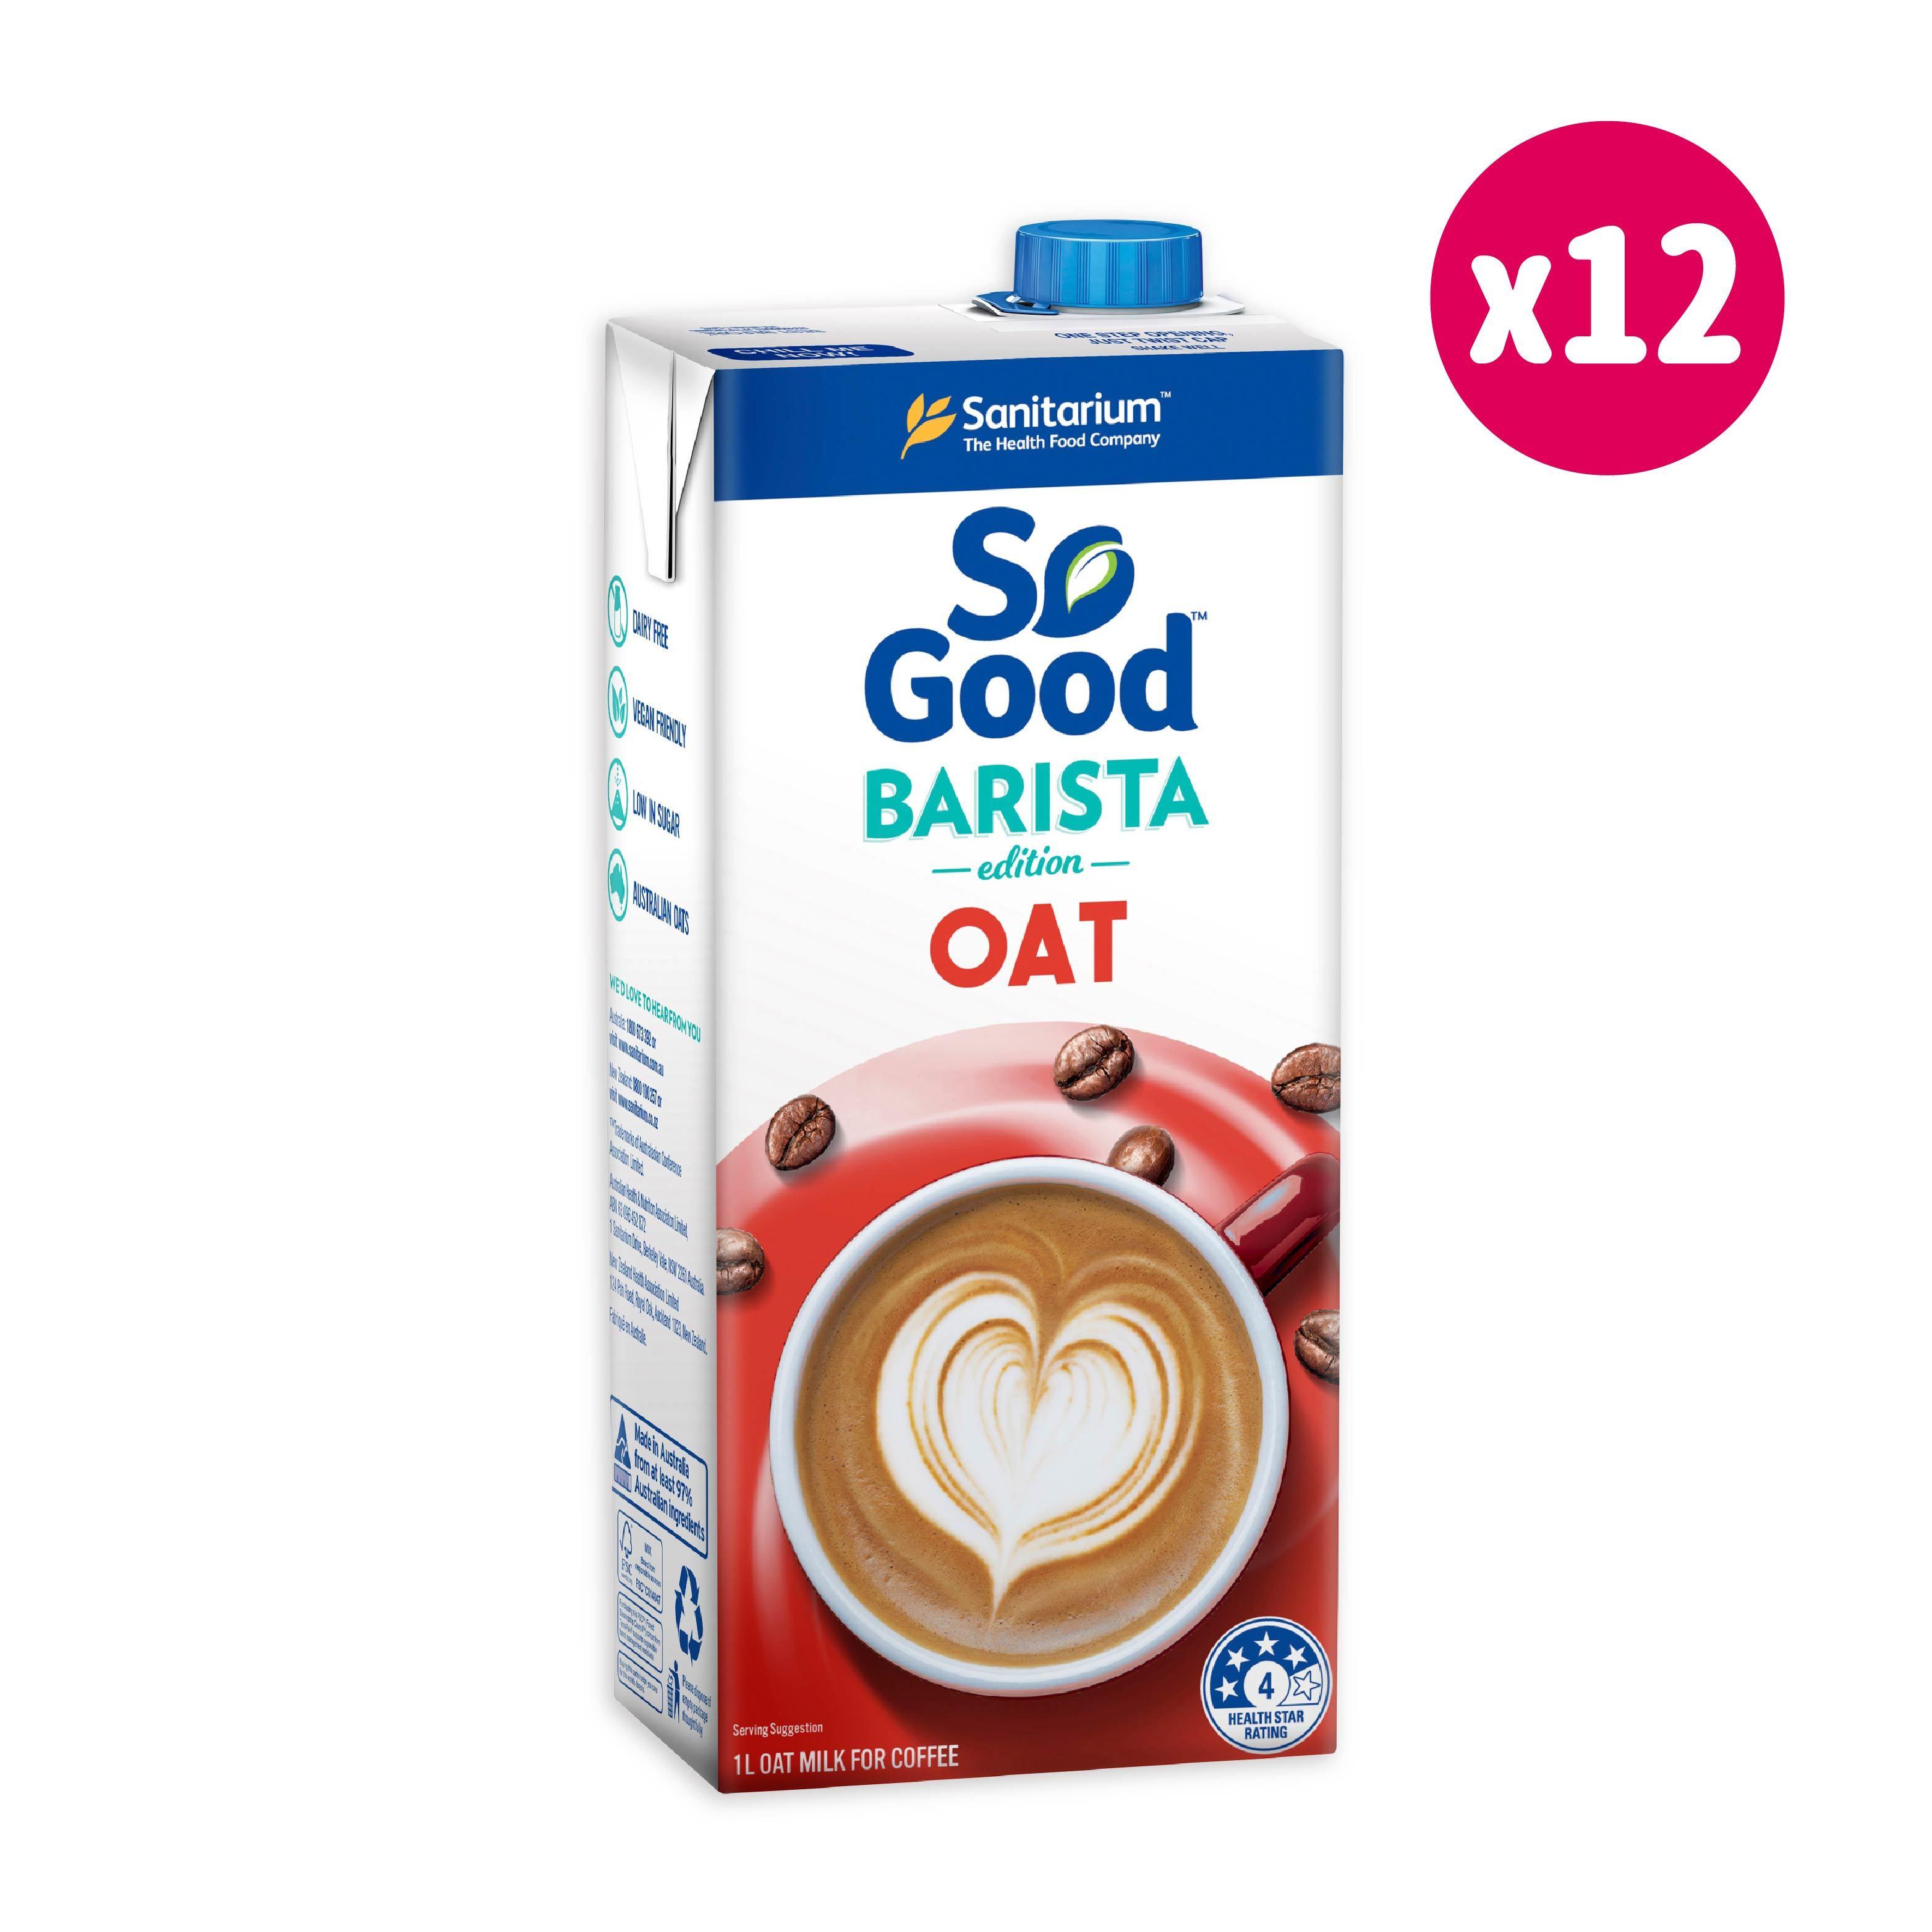 澳洲SO GOOD BARISTA 燕麥奶*12/箱(無糖1000ml)